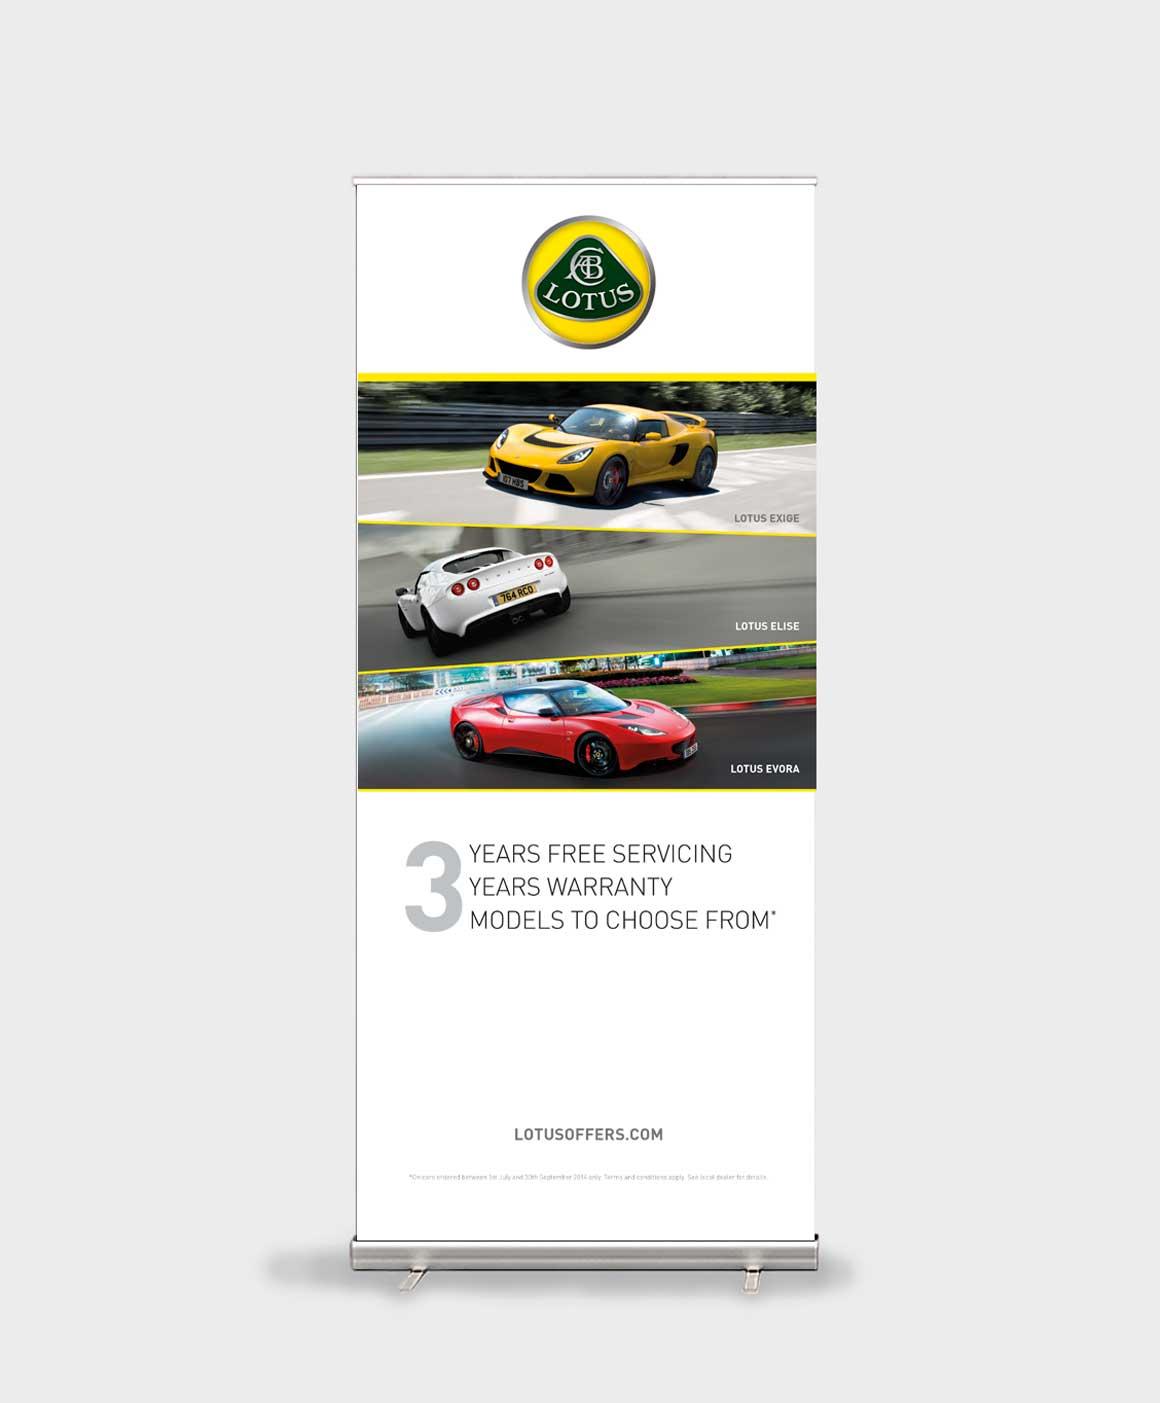 Pull up banner for Lotus Elise Exige Evora dealer campaign created by Norfolk ad agency Greenwood&Bell